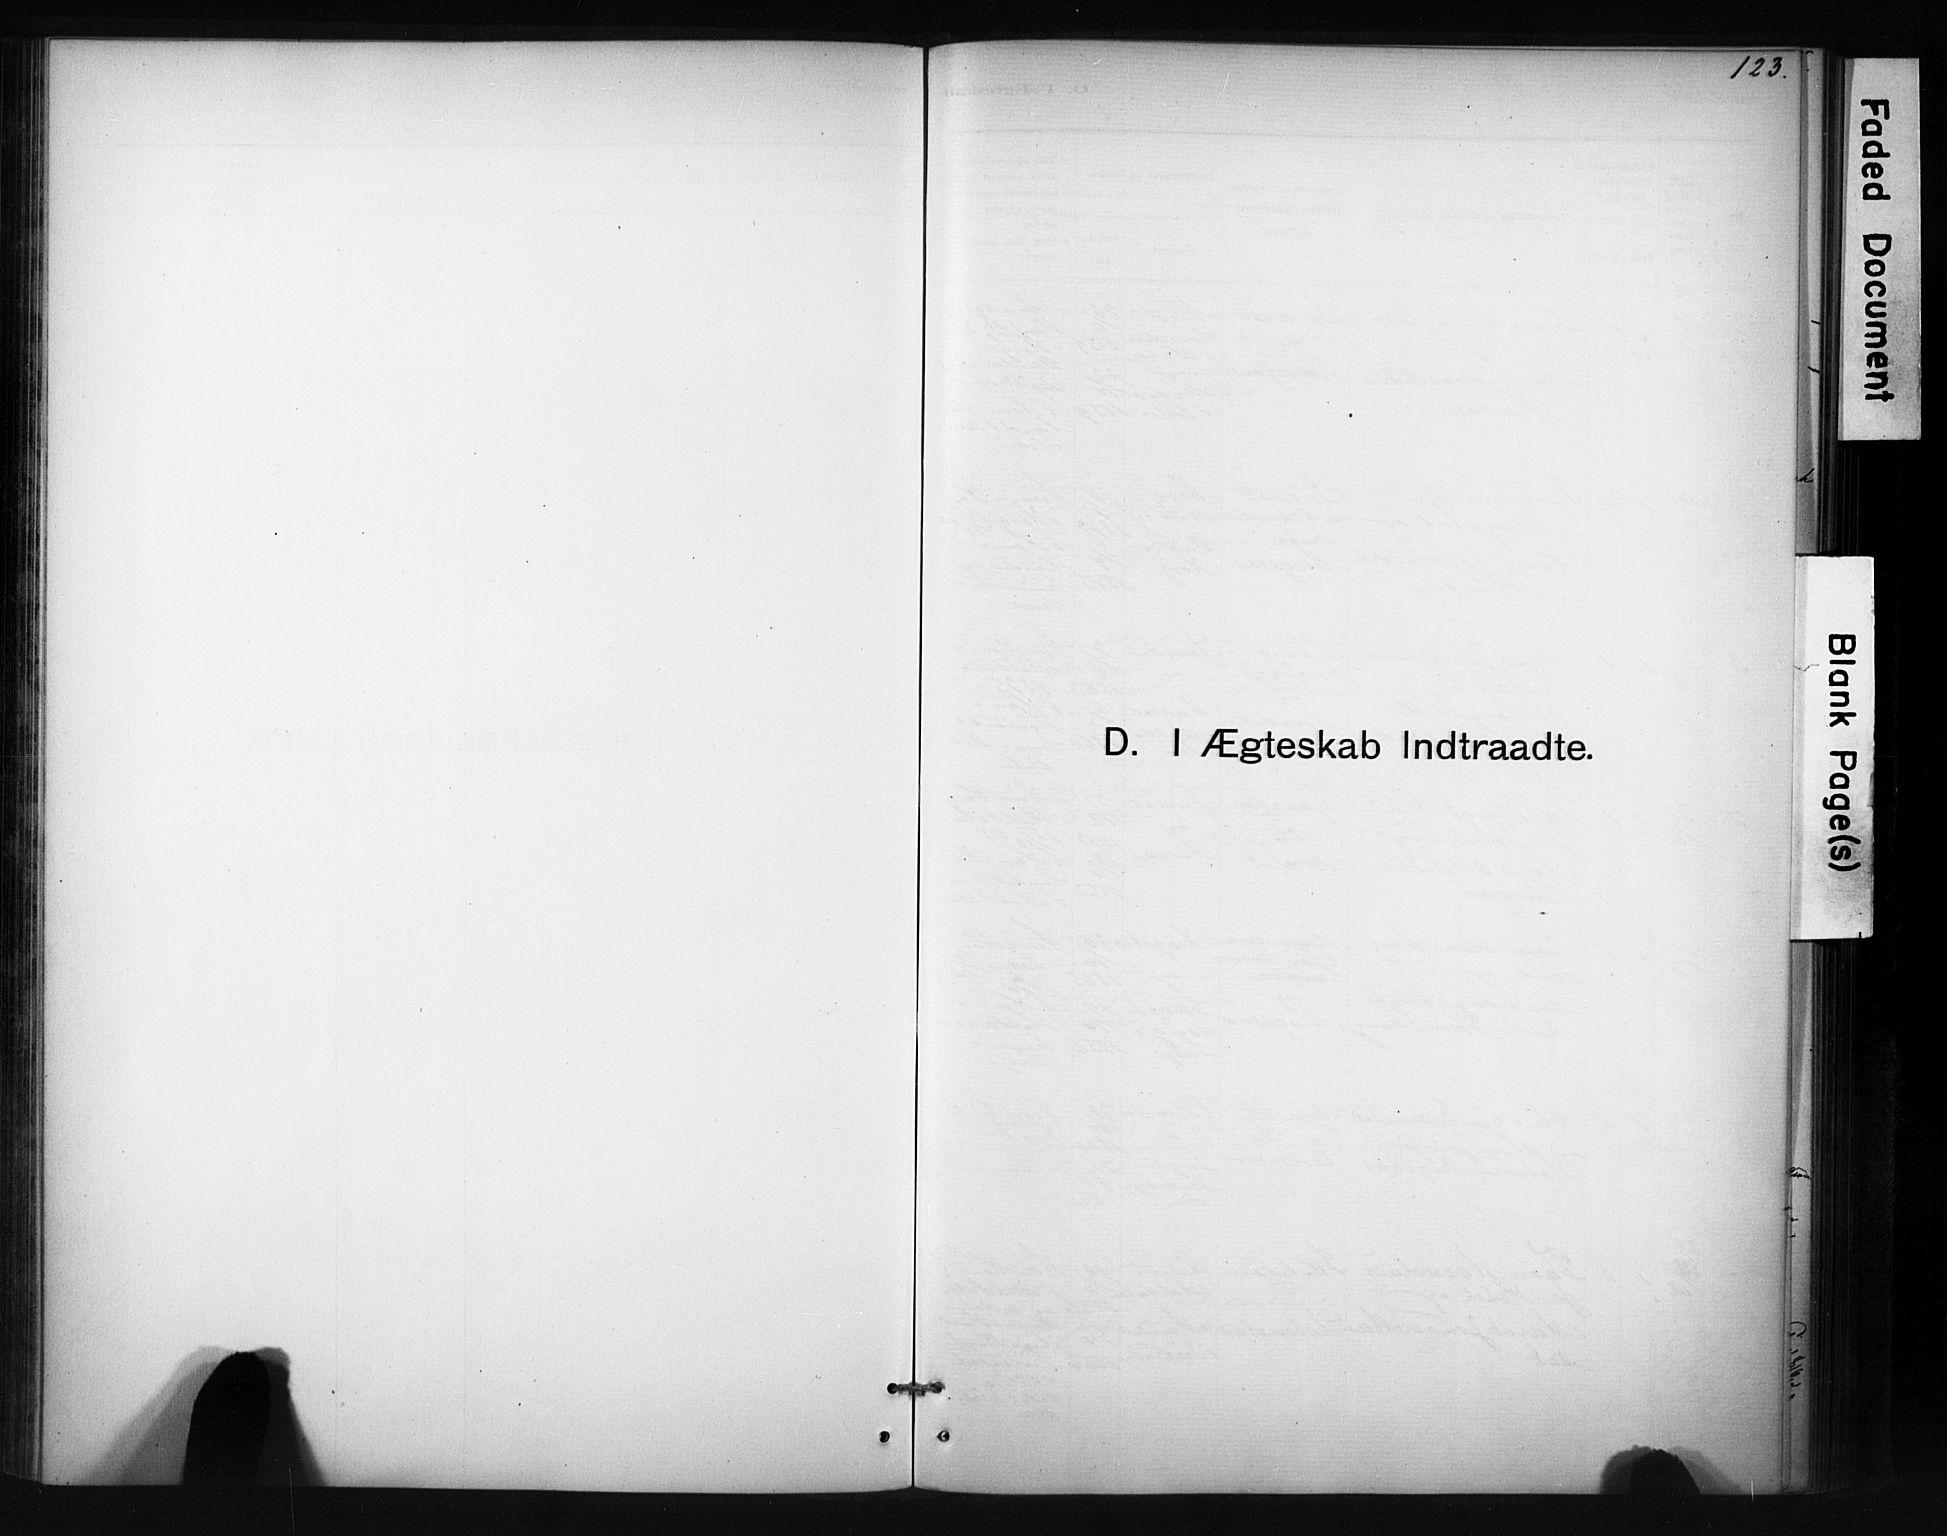 SAT, Ministerialprotokoller, klokkerbøker og fødselsregistre - Sør-Trøndelag, 694/L1127: Parish register (official) no. 694A01, 1887-1905, p. 123